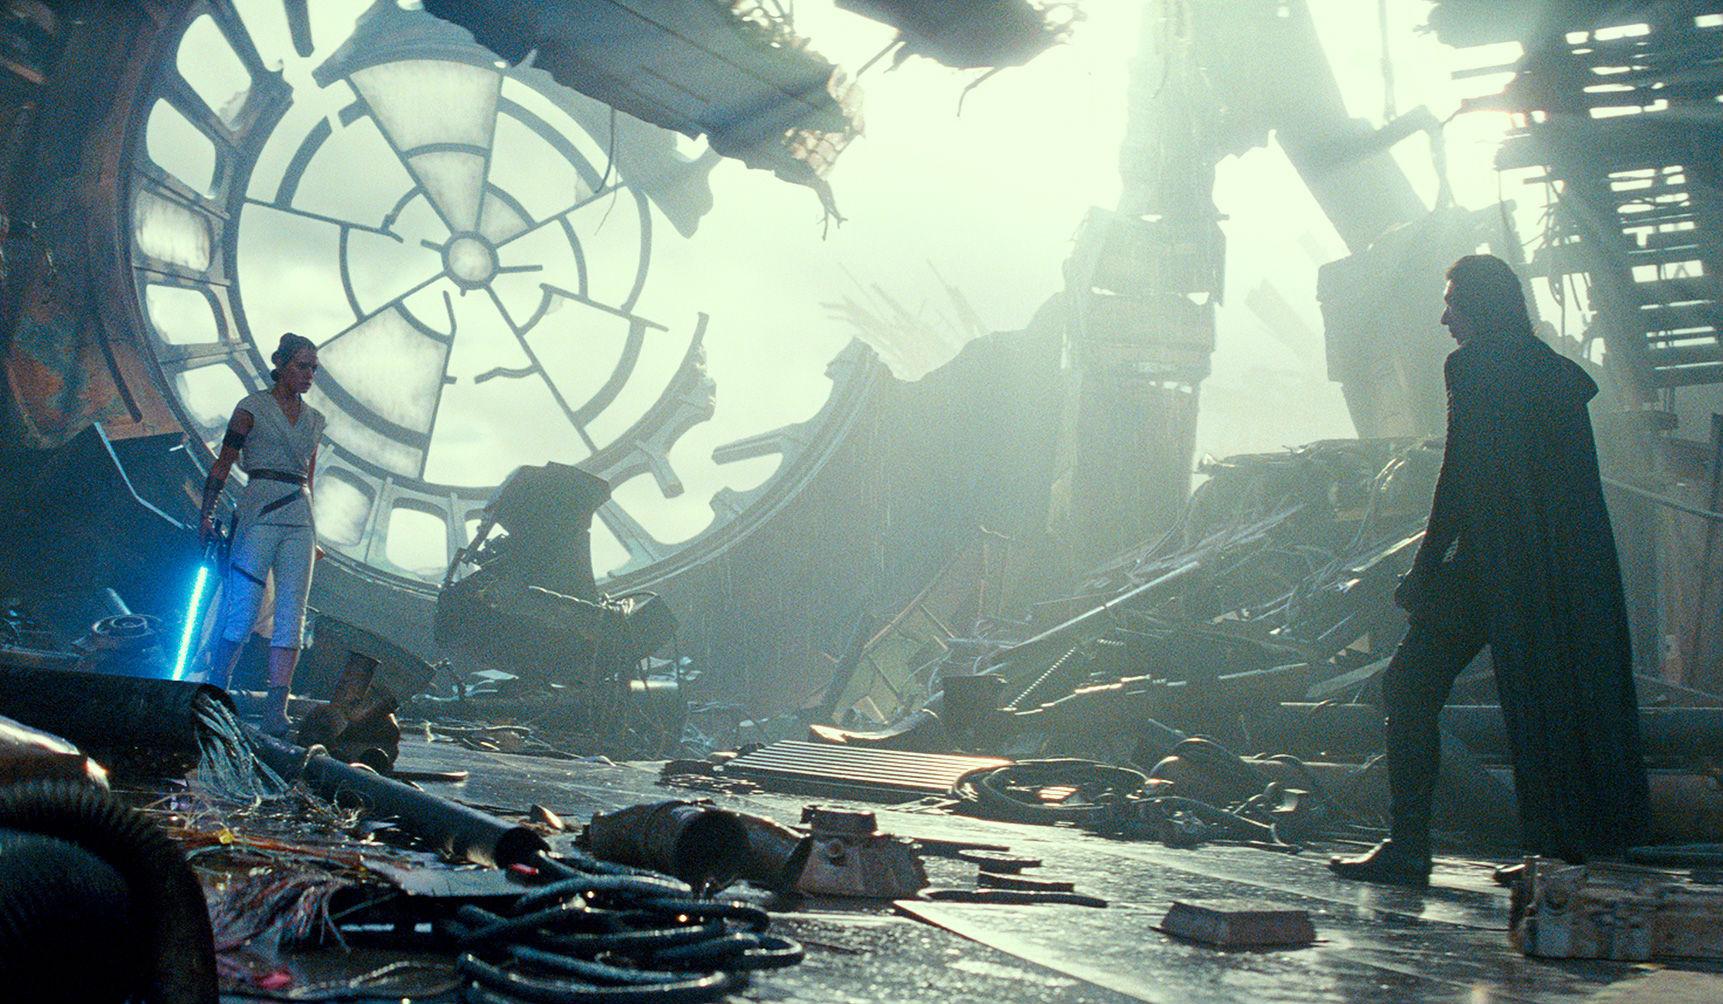 Star Wars Episodio IX: L'Ascesa di Skywalker – Analisi spoiler